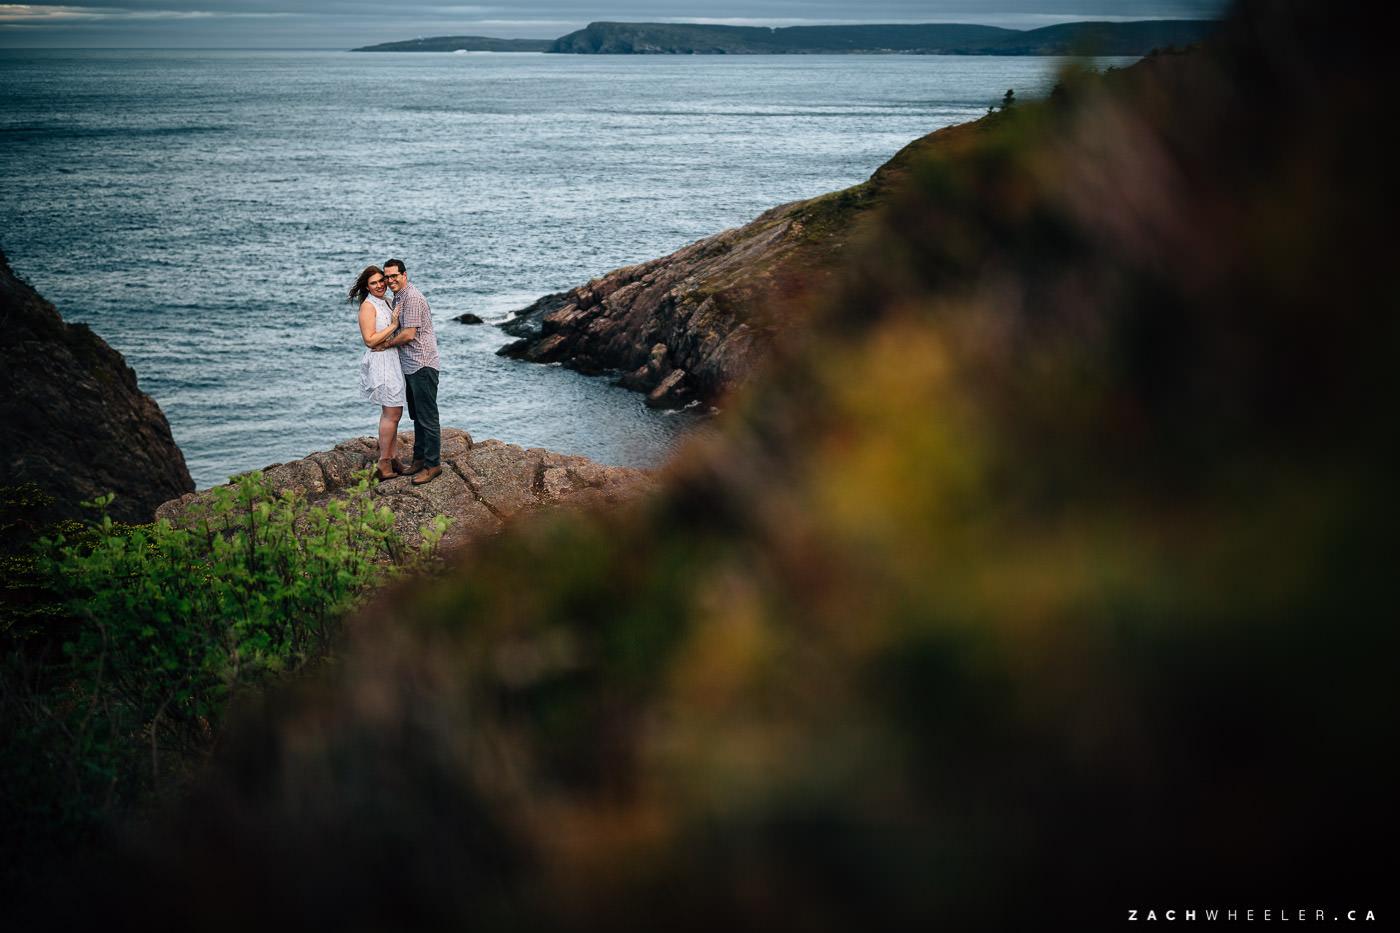 Kim-Dan-Engagement-Photography-StJohns-Newfoundland-11